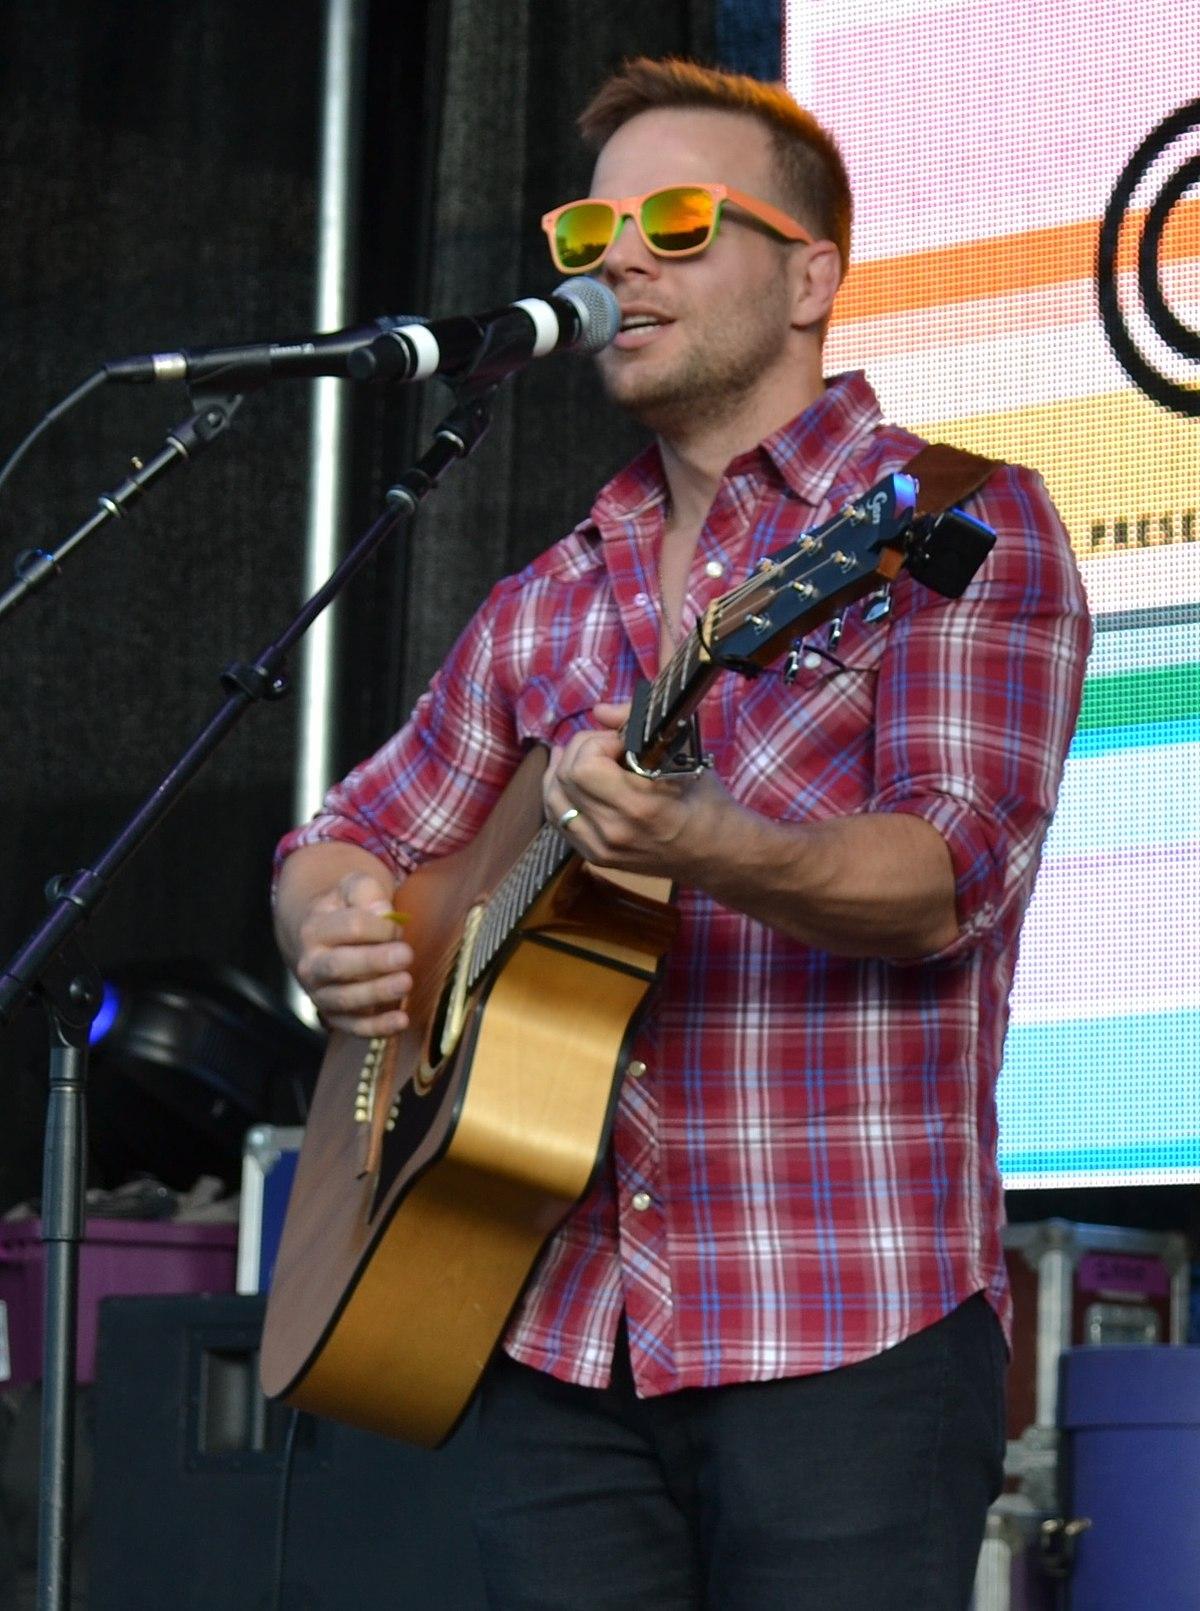 Washington Dc Tours >> Tom Goss (musician) - Wikipedia